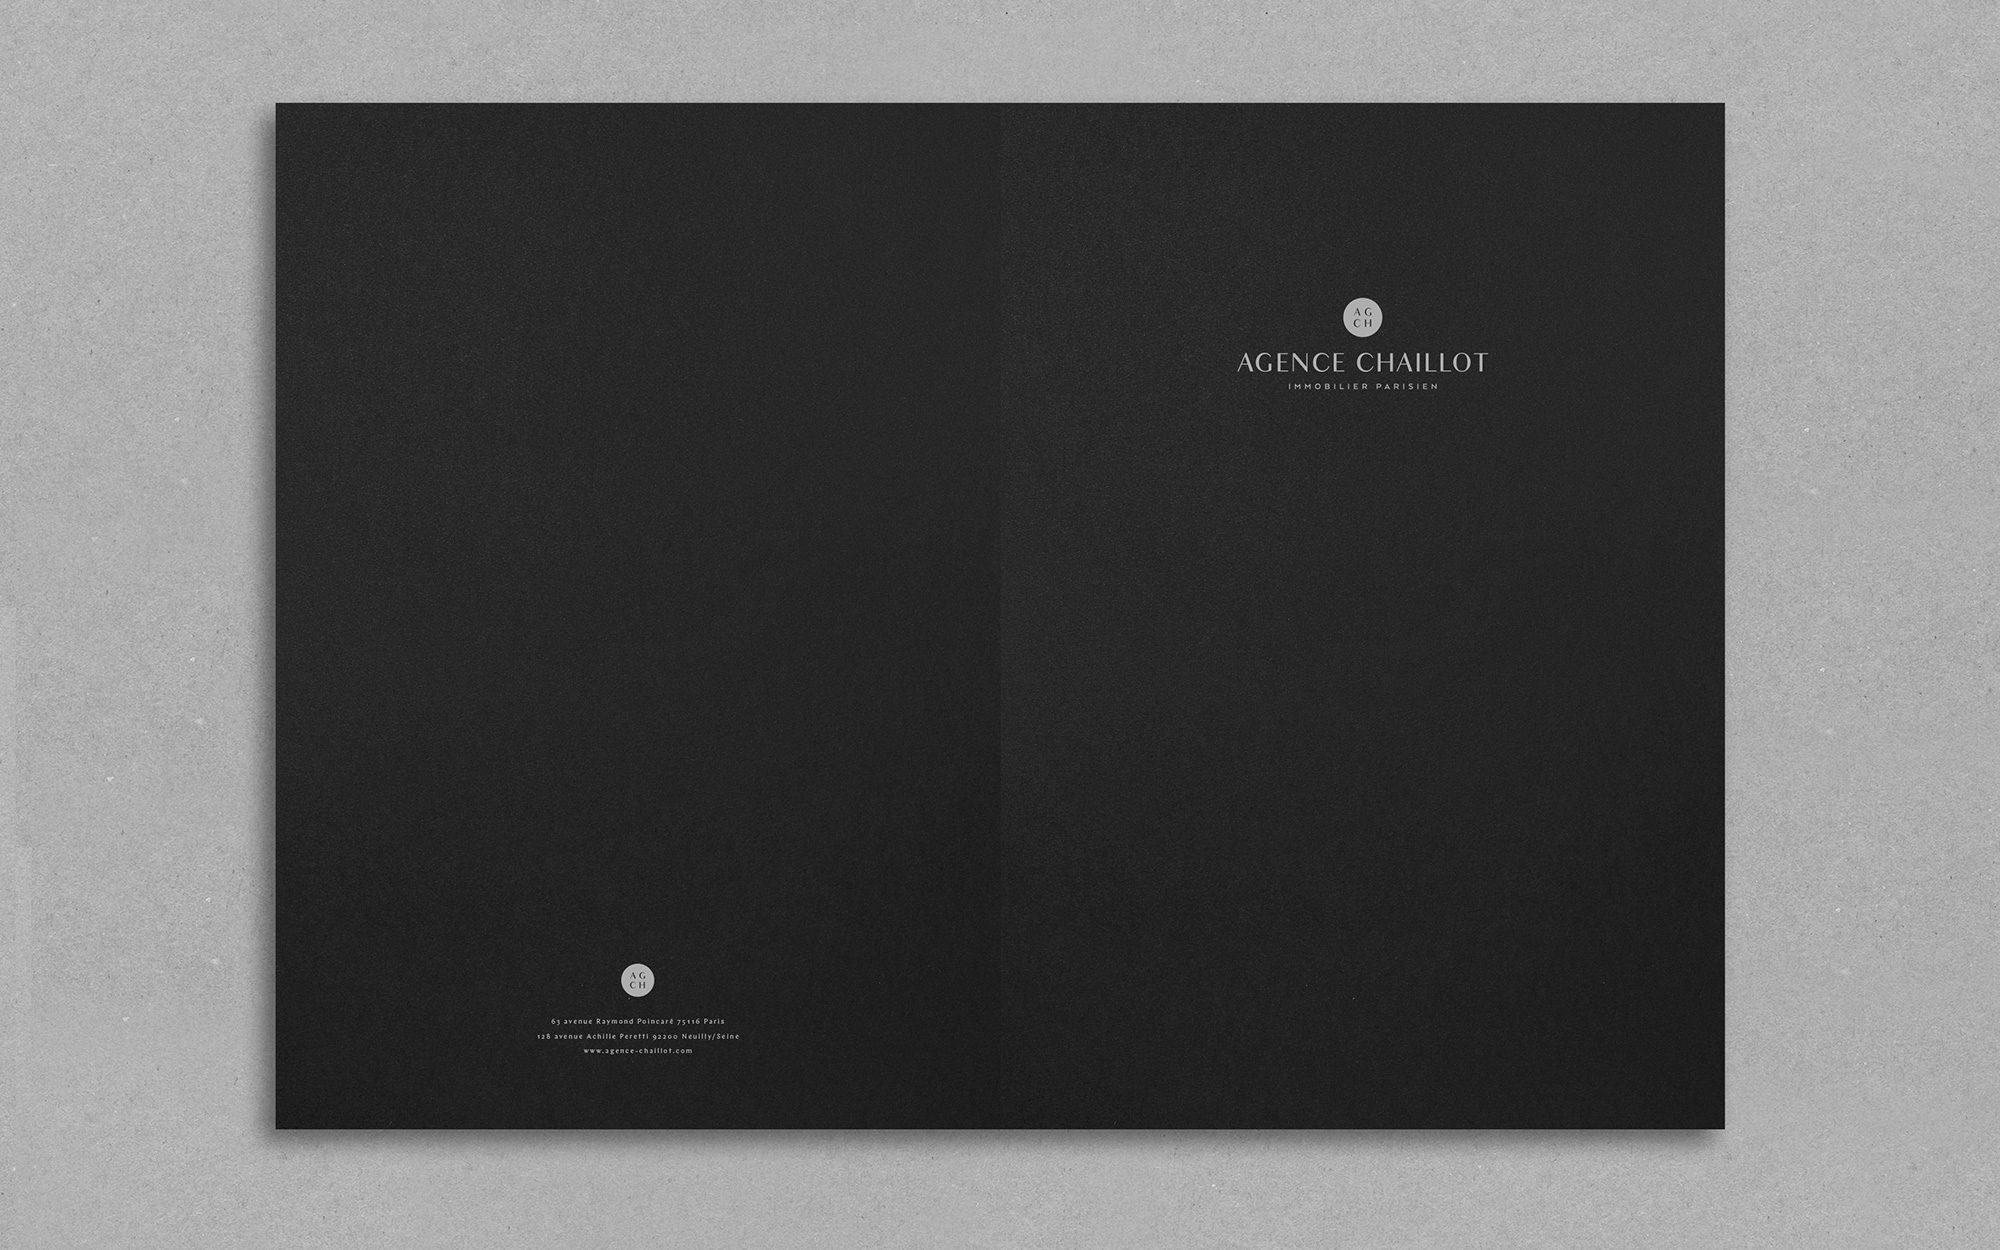 05-sindbad-gillain-agence-chaillot-big